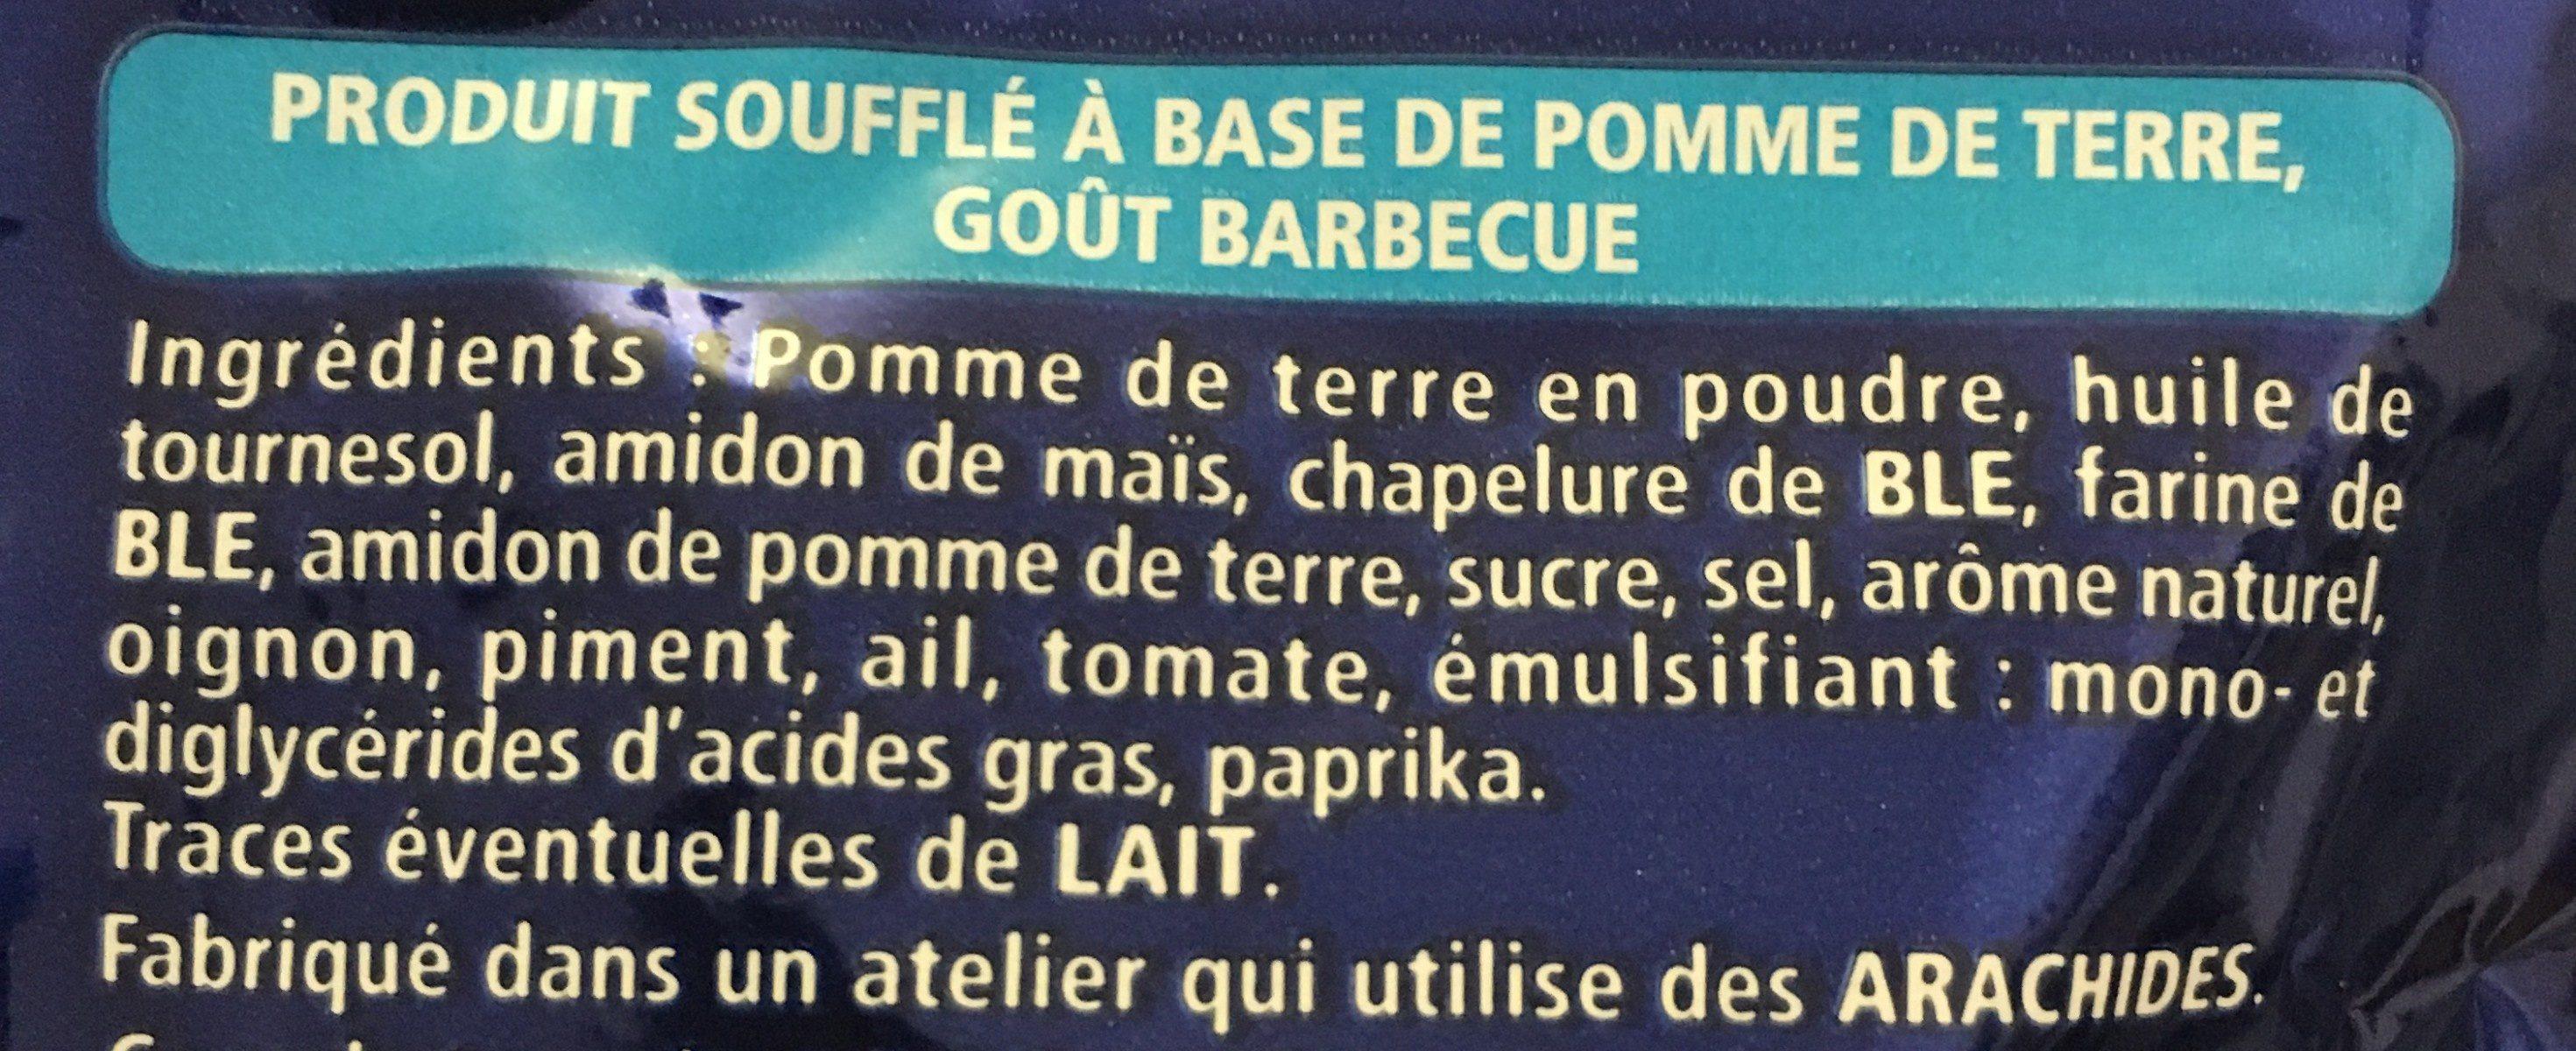 Monster Munch Goût Barbecue 85G - Ingrédients